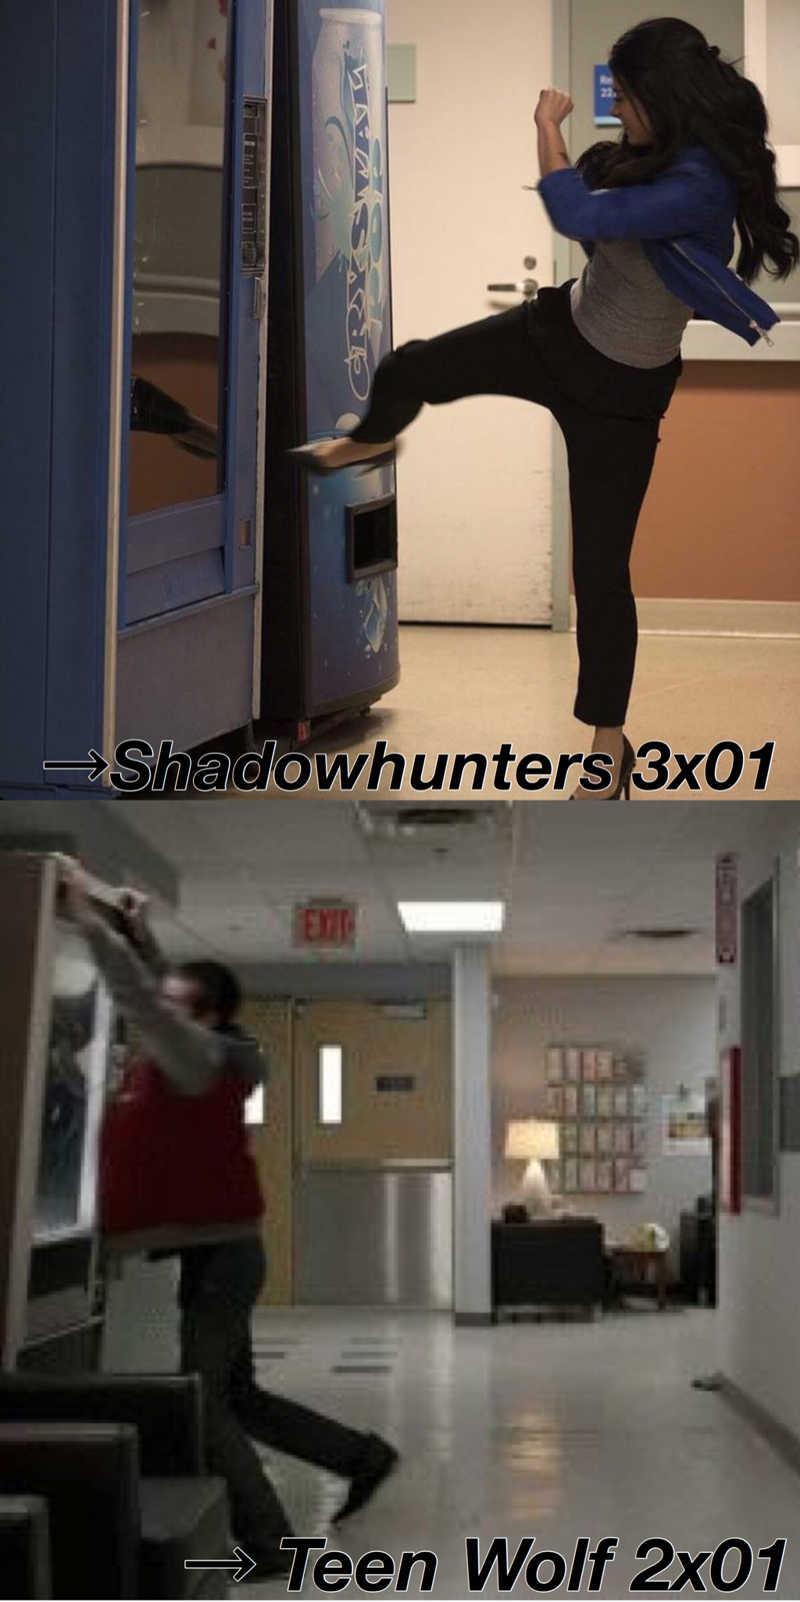 human vs shadowhunter: a vending machines tale